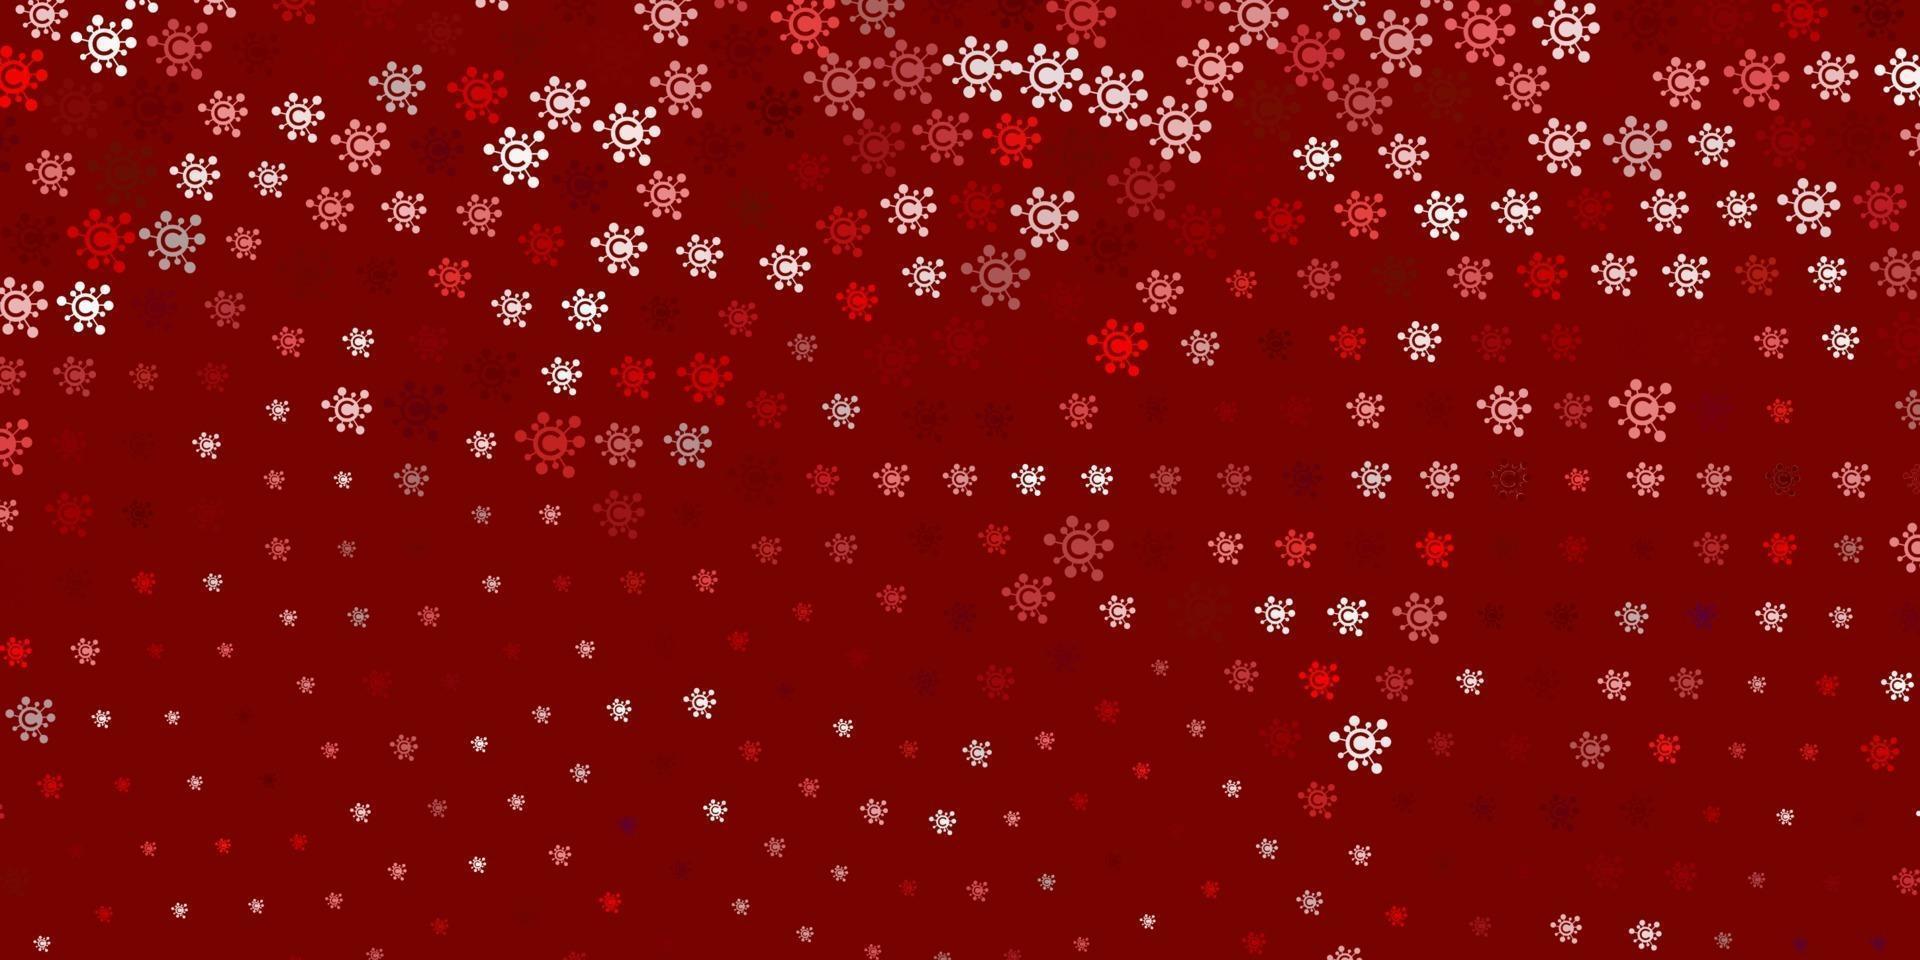 Telón de fondo de vector rojo claro con símbolos de virus.